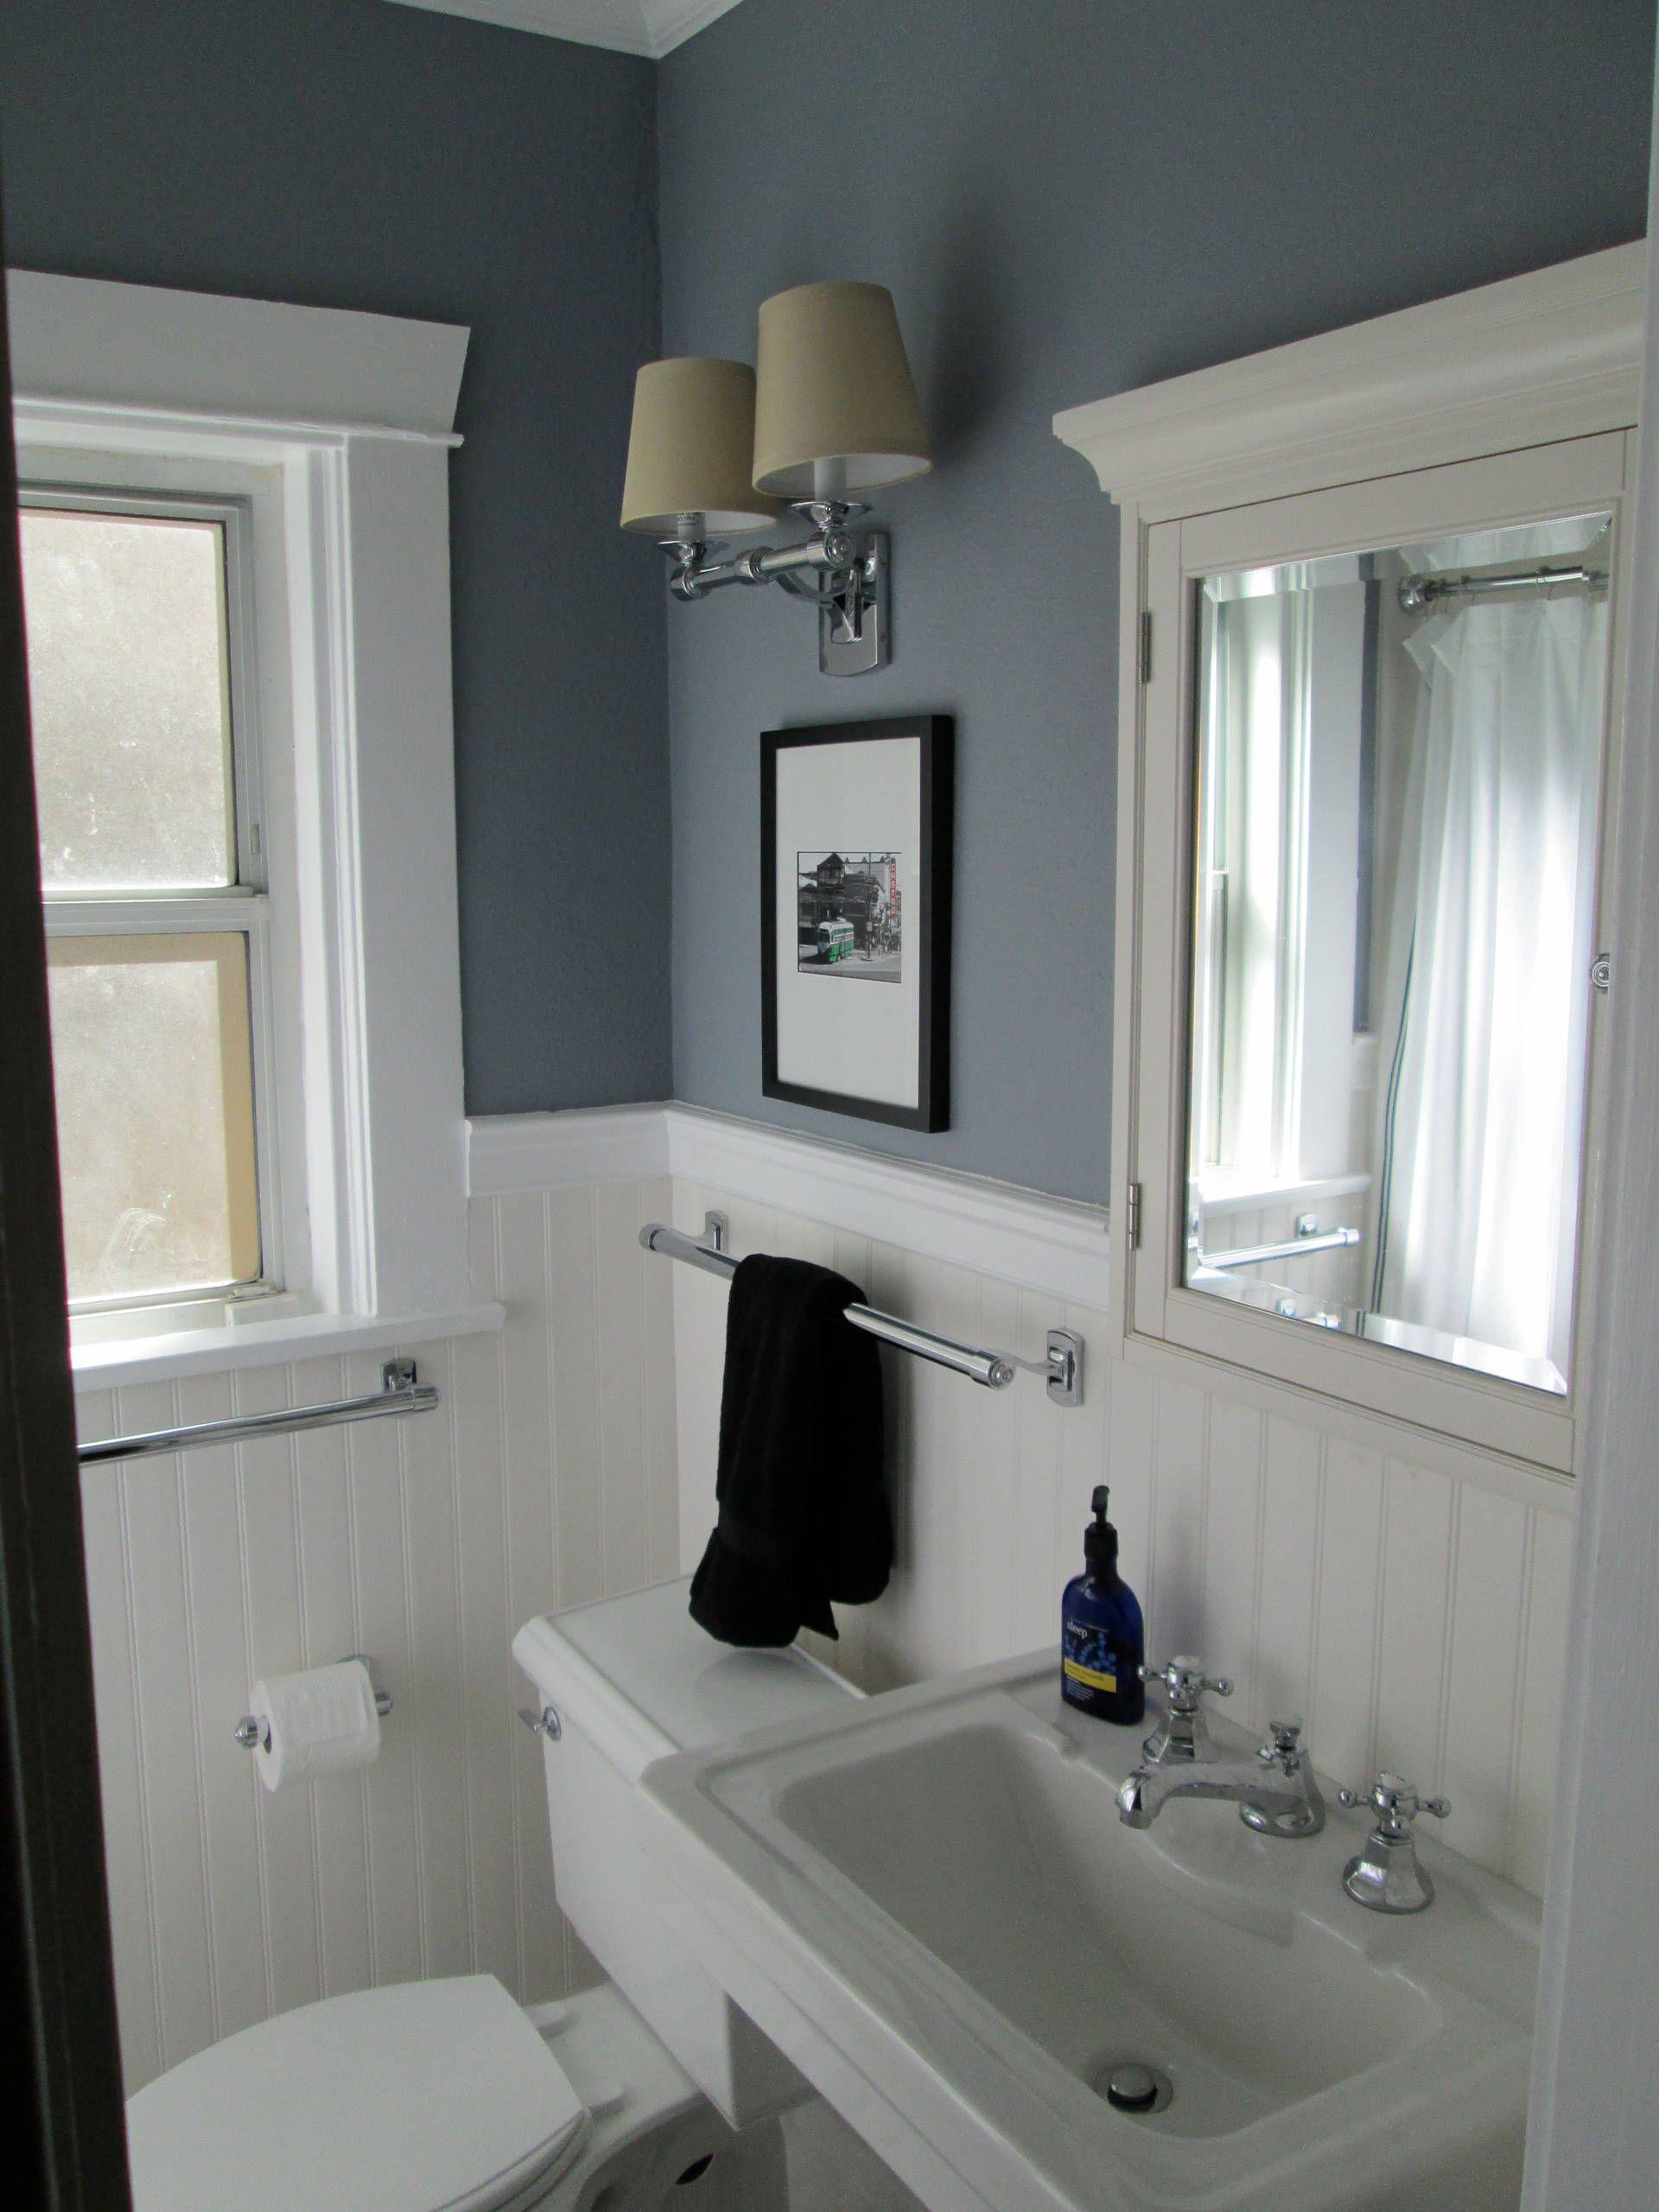 Main Floor Bathroom Remodel Idea 1920s Bathroom